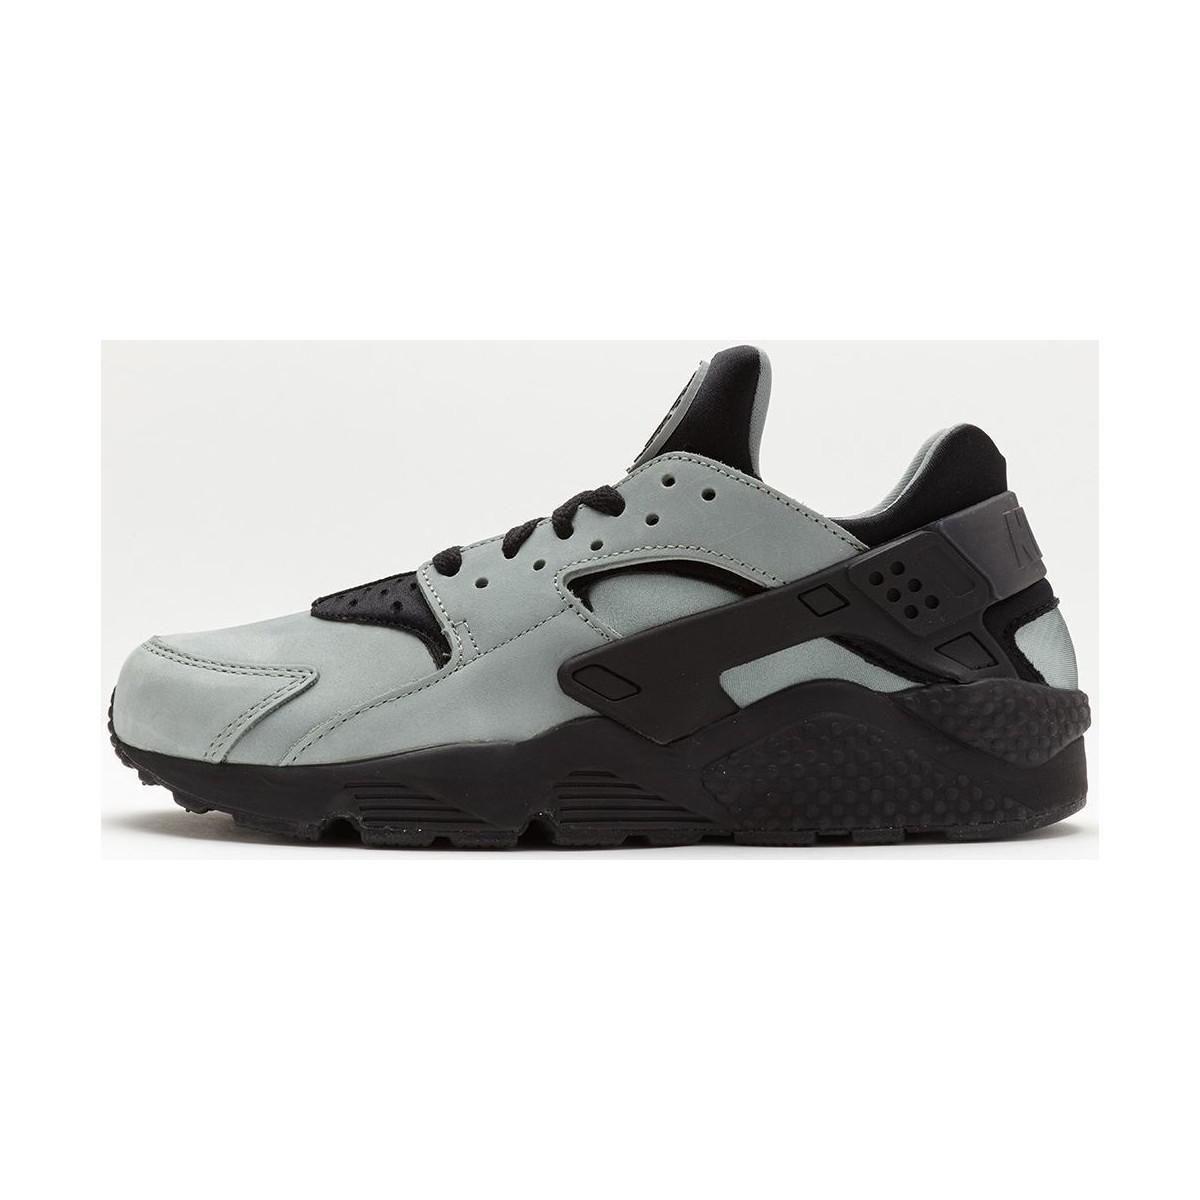 93f3383a46aa Nike Air Huarache Premium Trainers In Mica Green Black 704830 301 ...